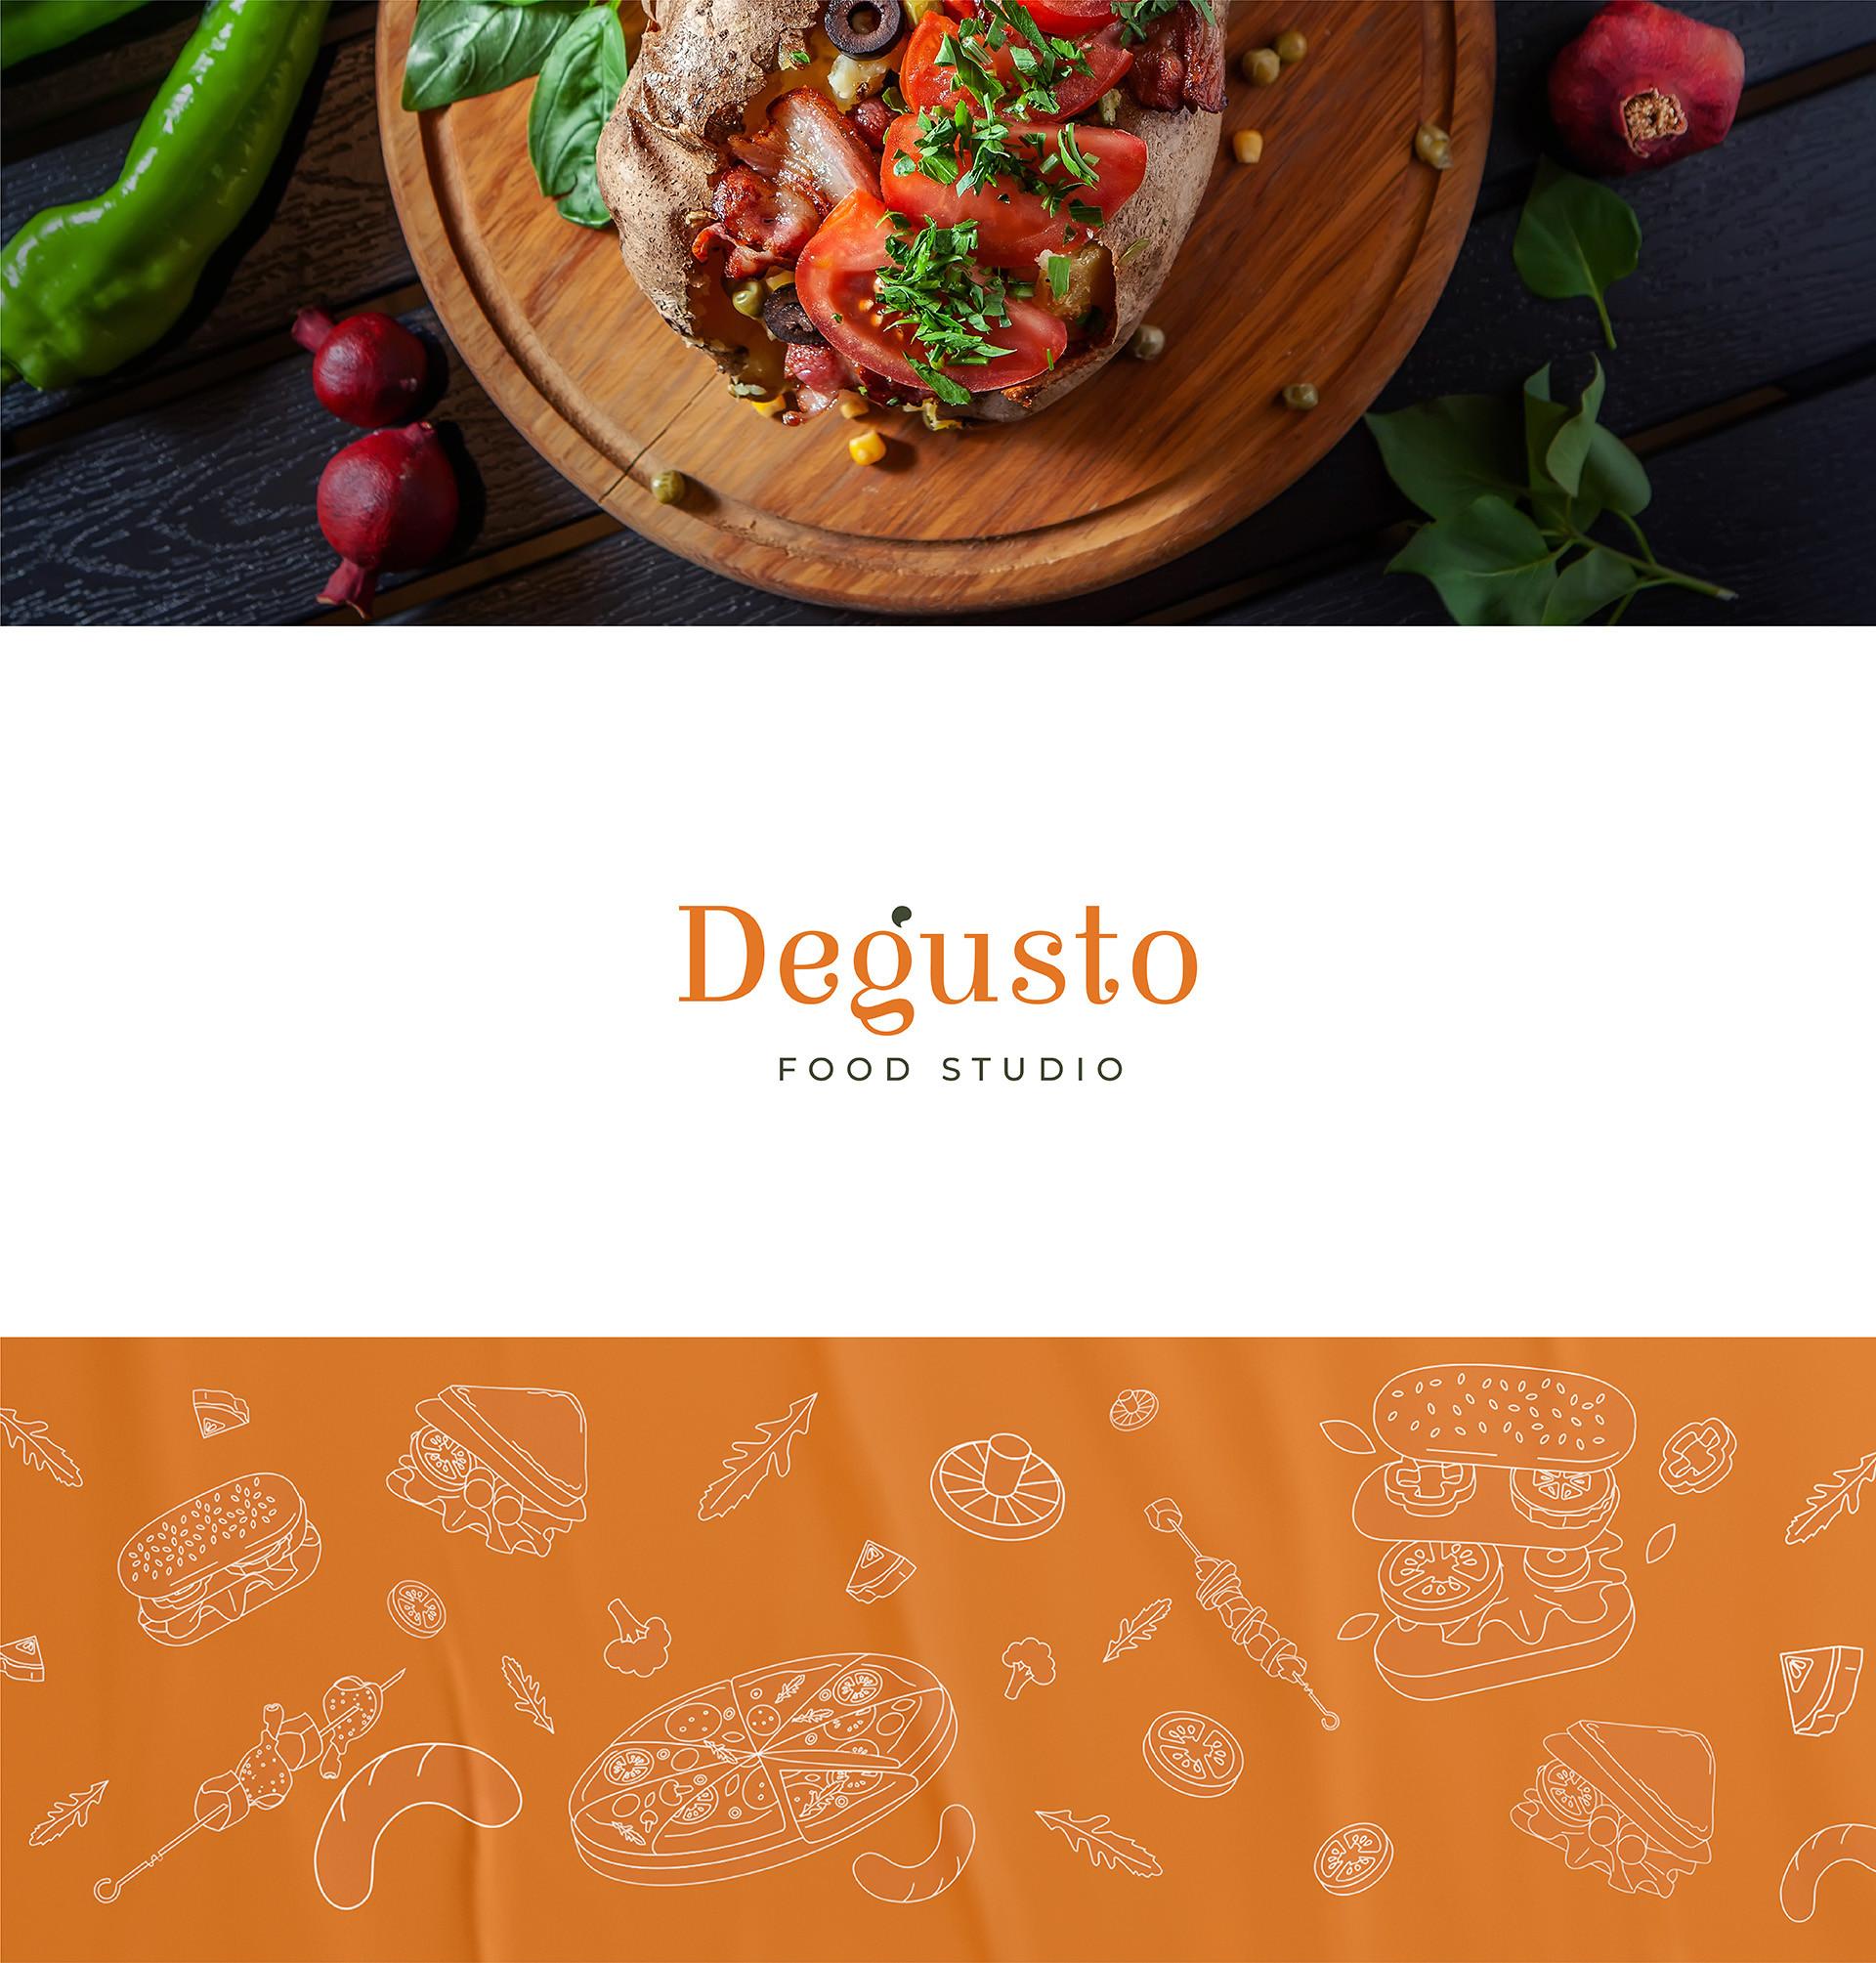 Degusto